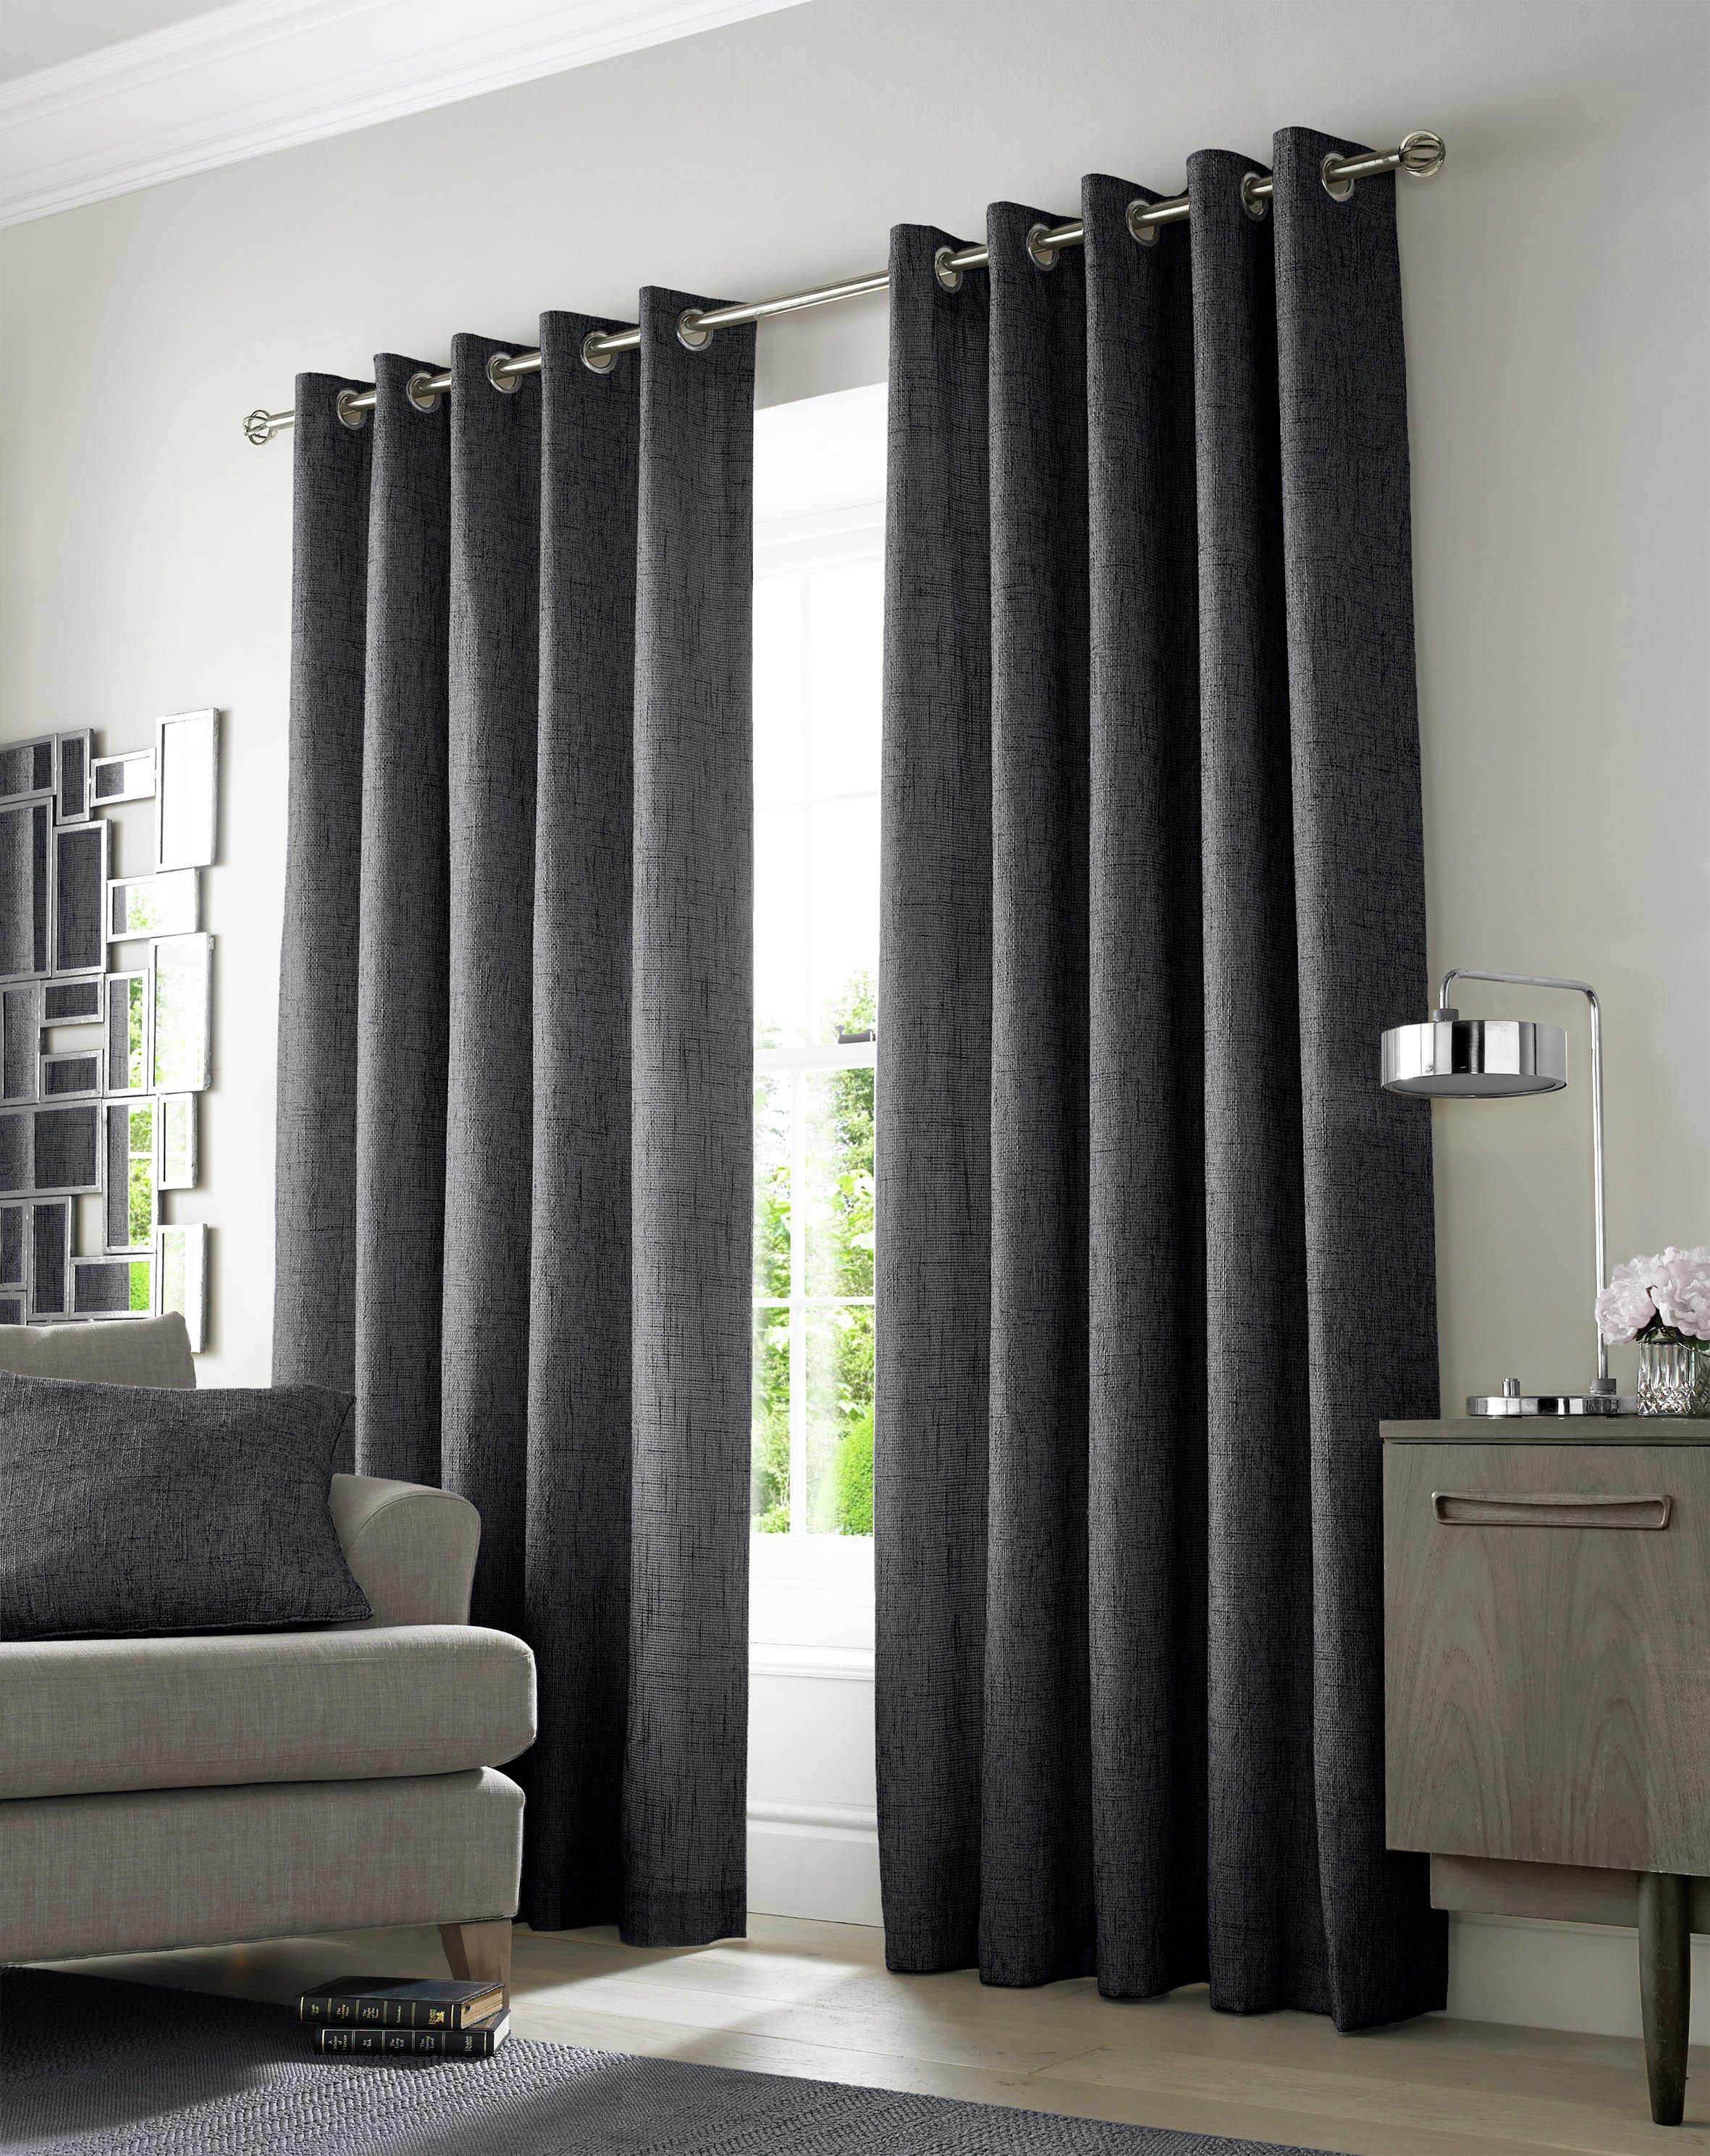 Academy Eyelet Curtains - 165x183cm - Charcoal.